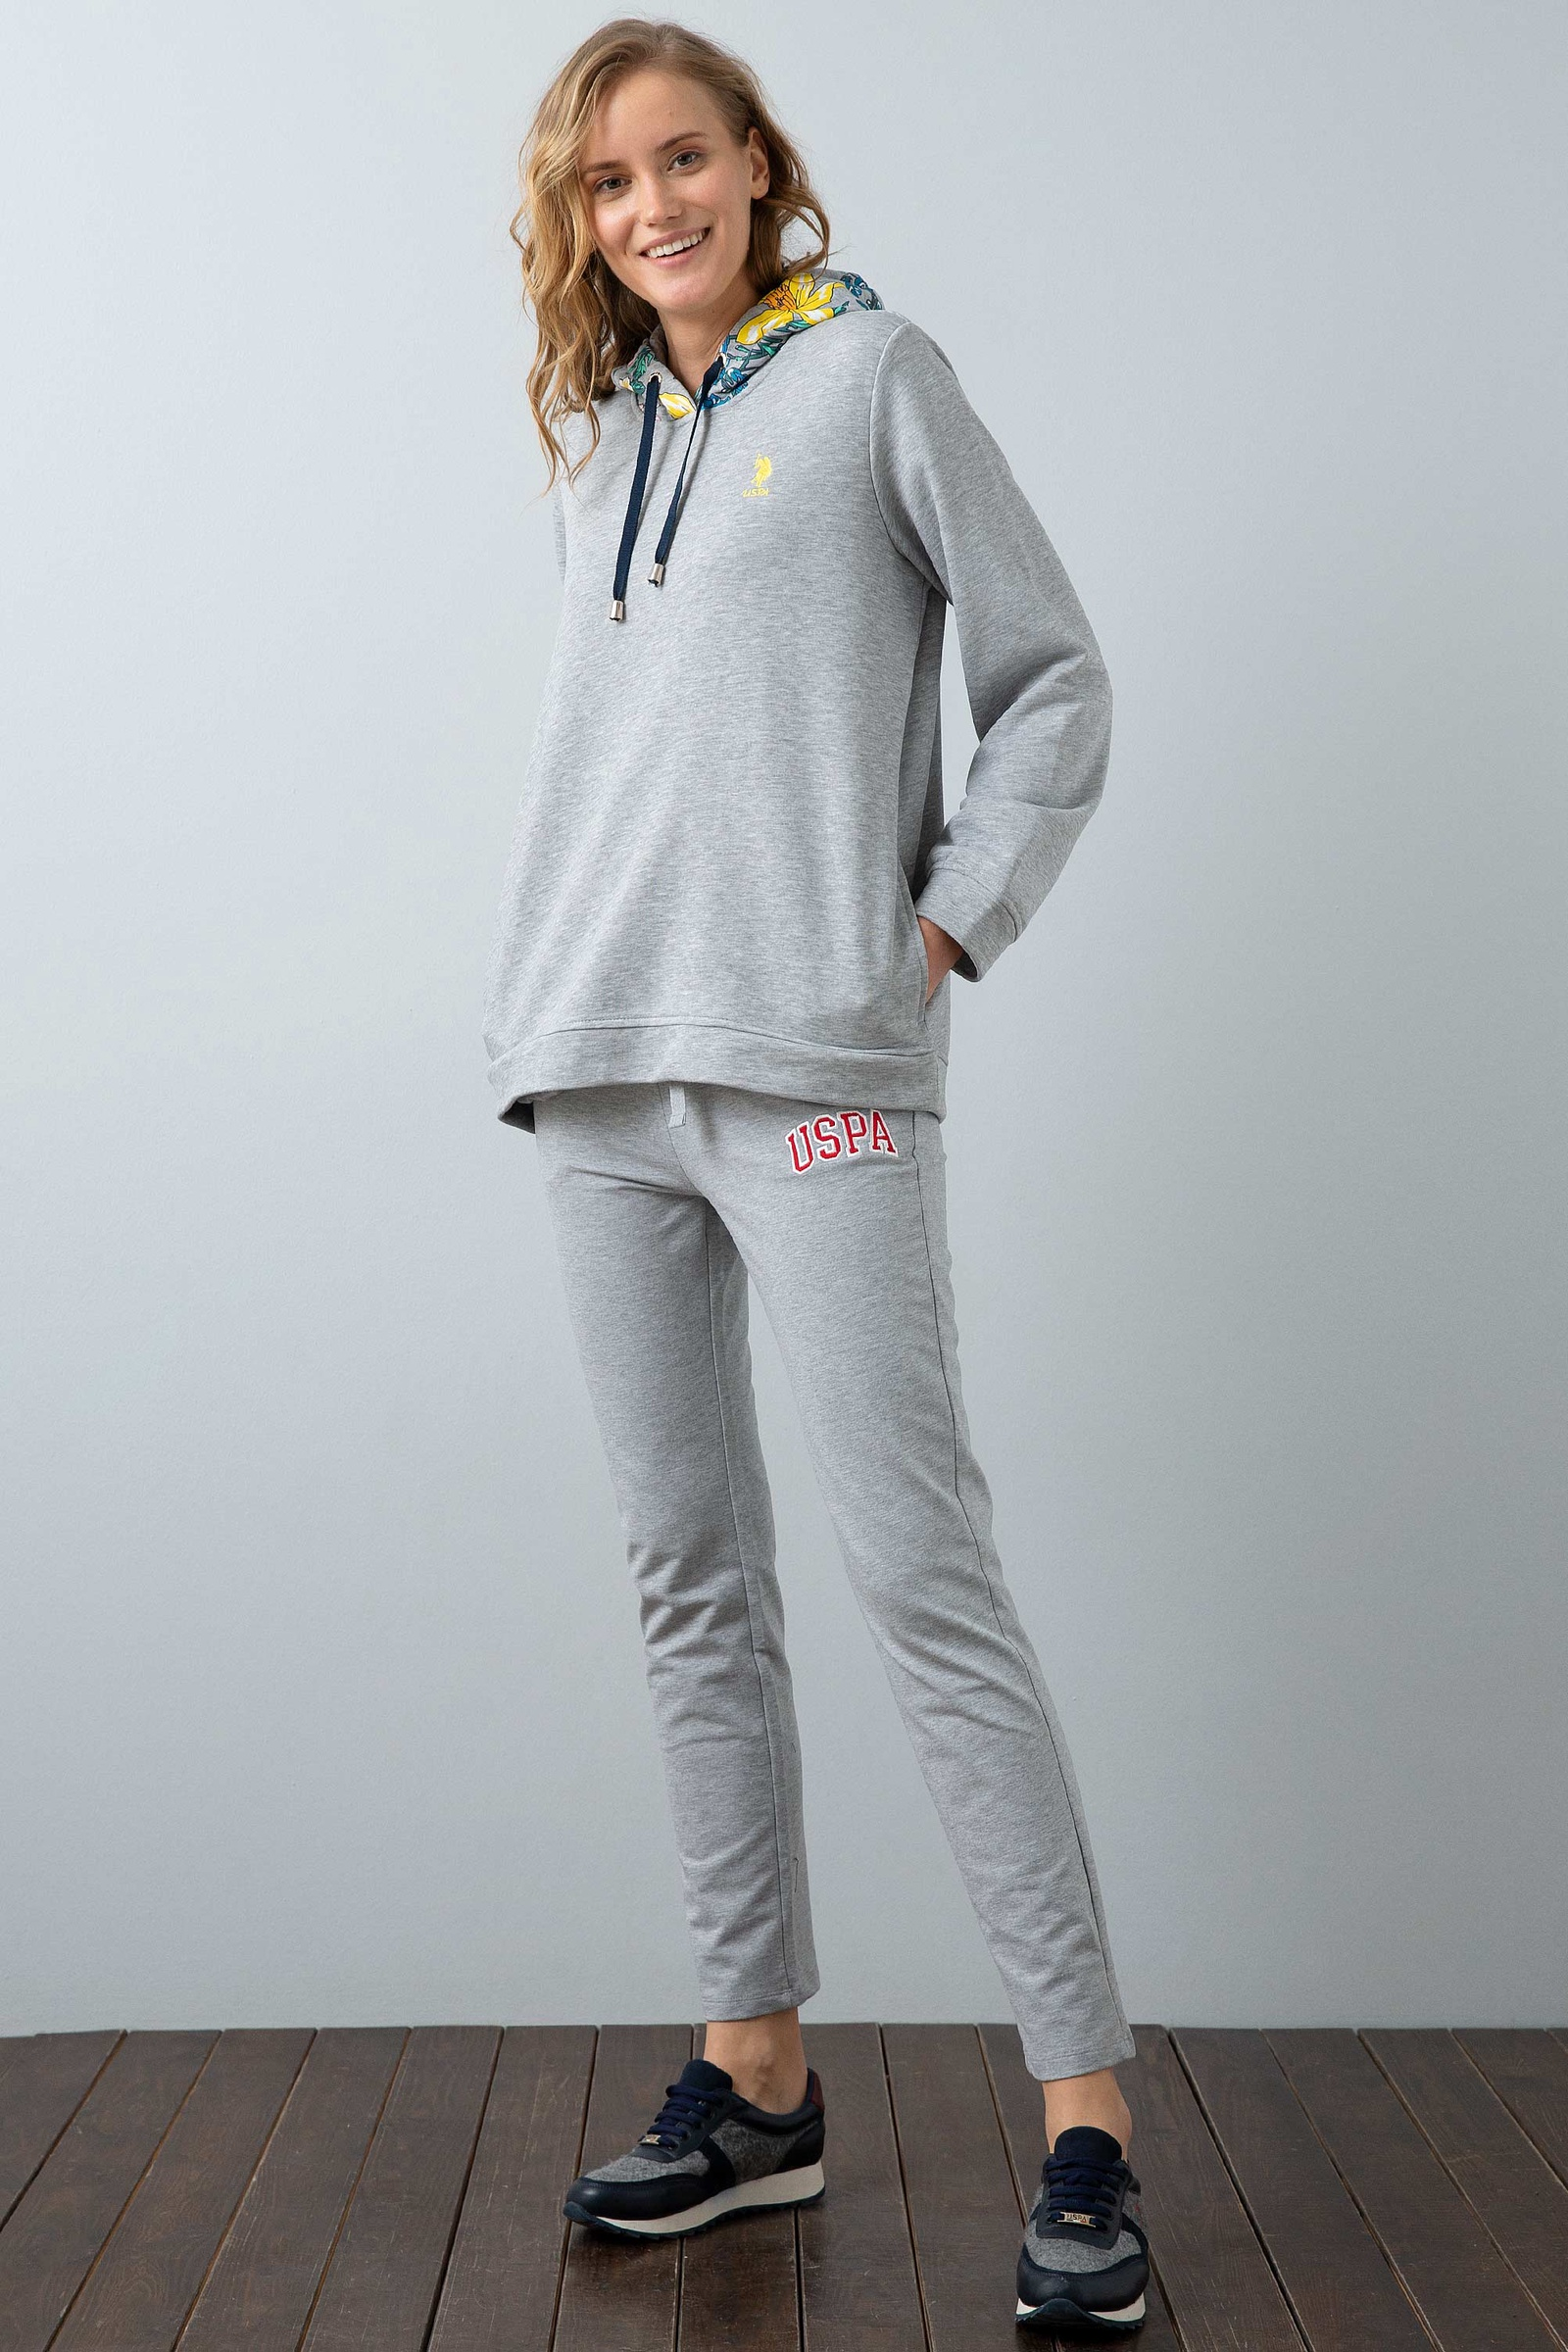 Брюки спортивные U.S. Polo Assn. брюки мужские u s polo assn цвет серый g081sz0780kenn8k vr006 размер 30 46